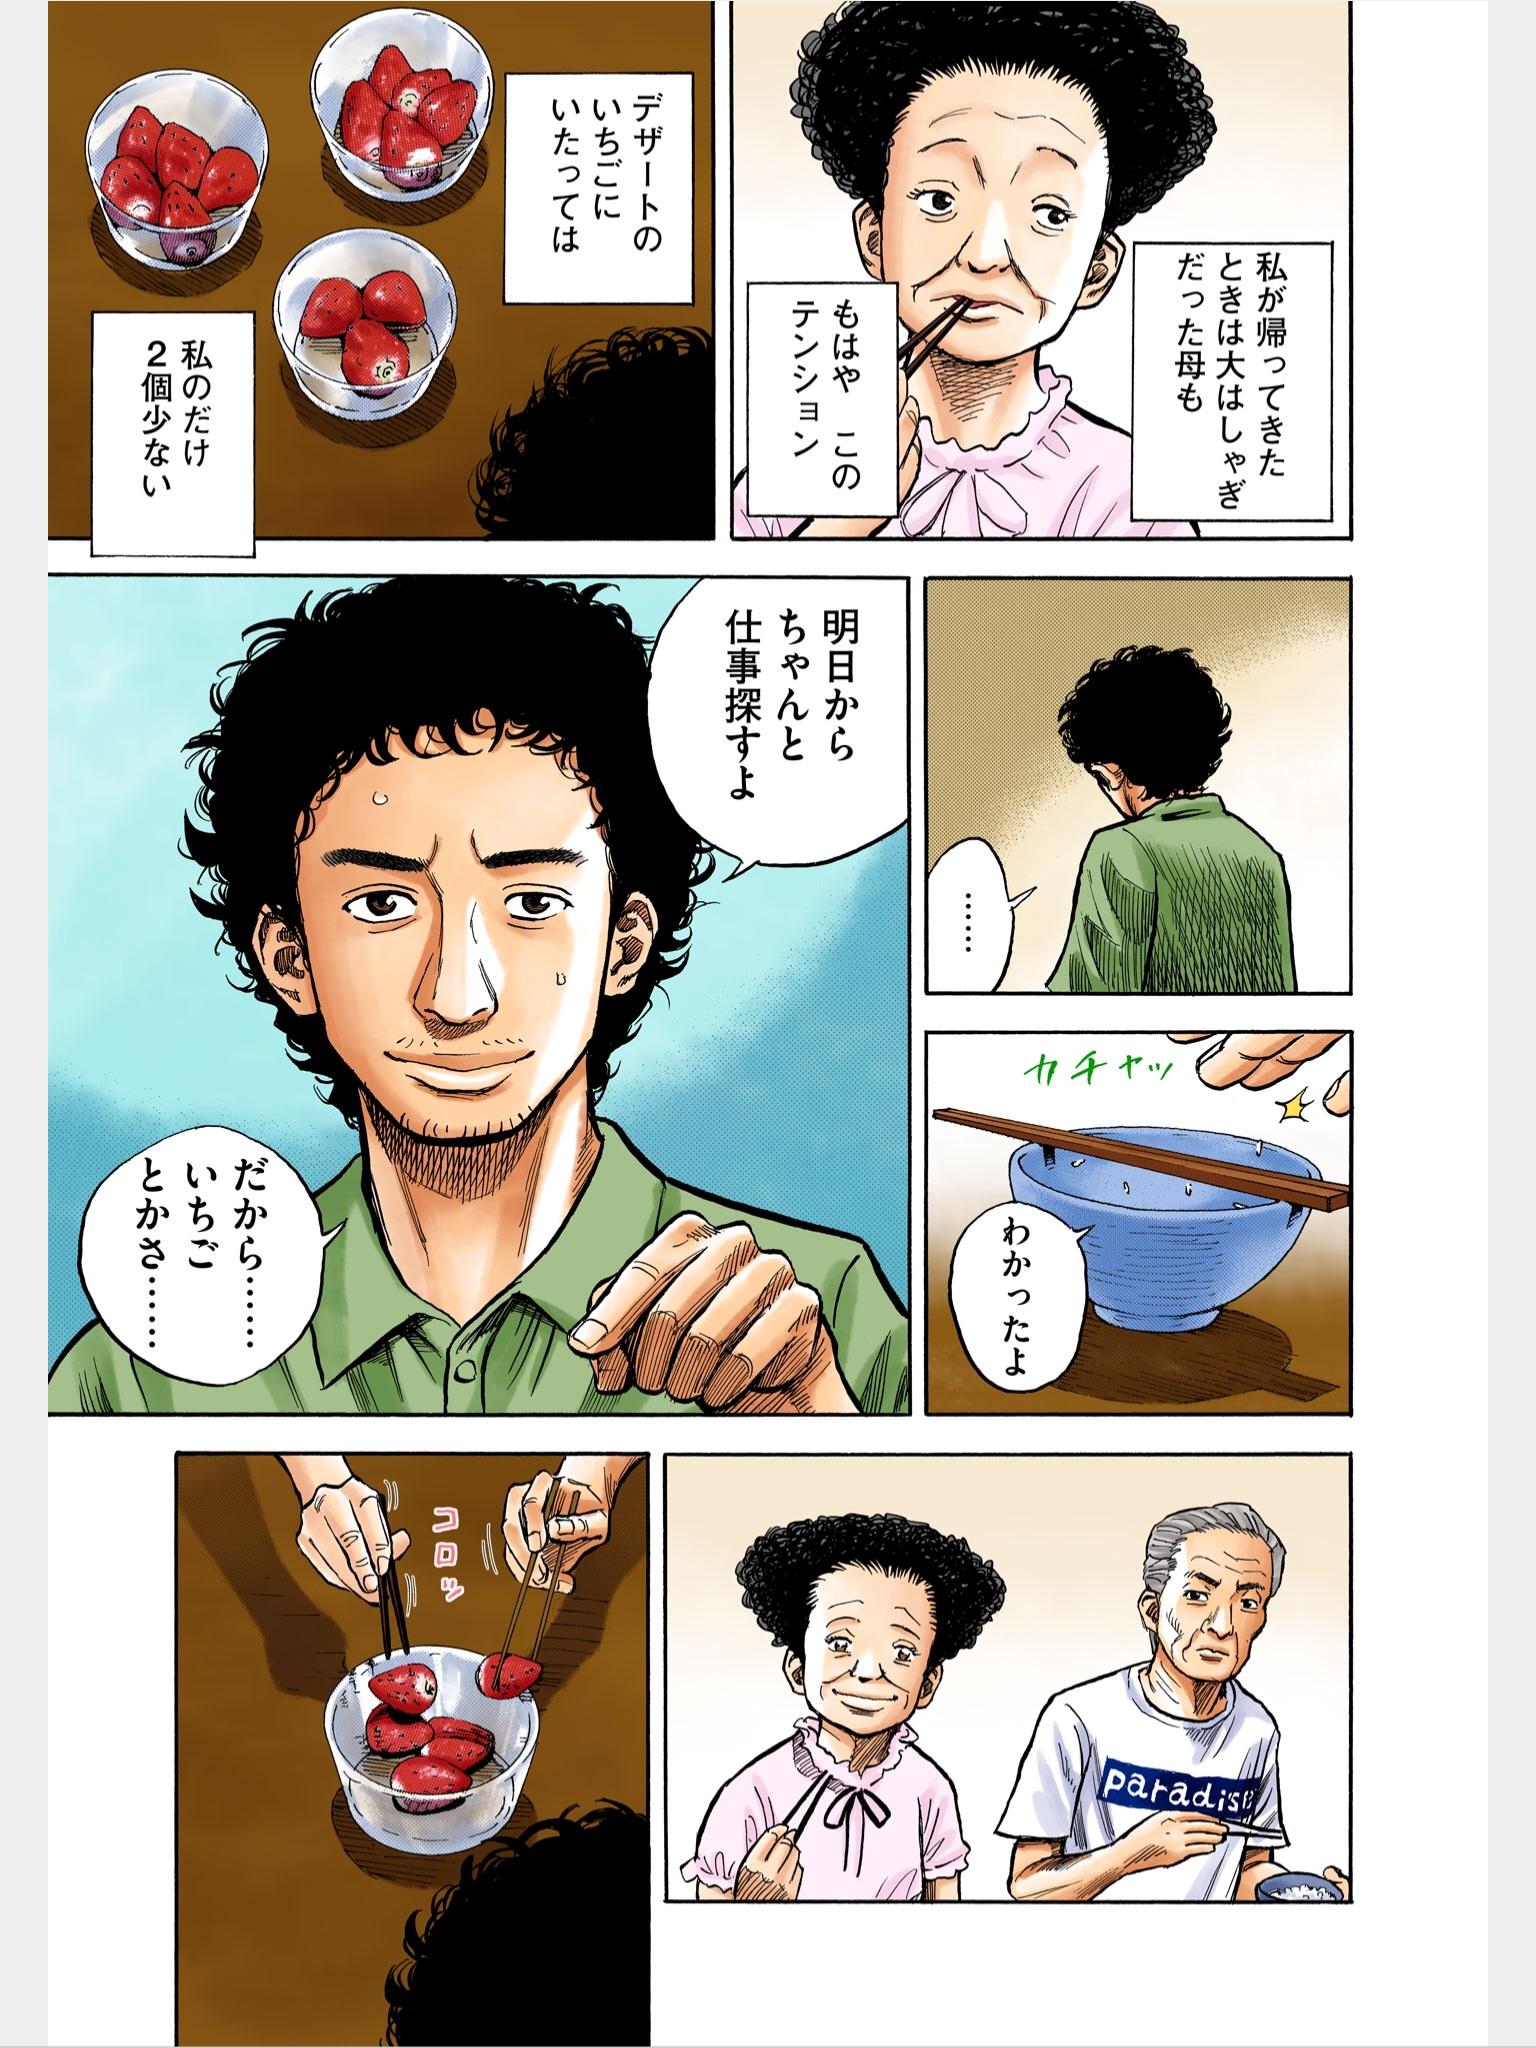 uchukyodai_vol.1_4c_22